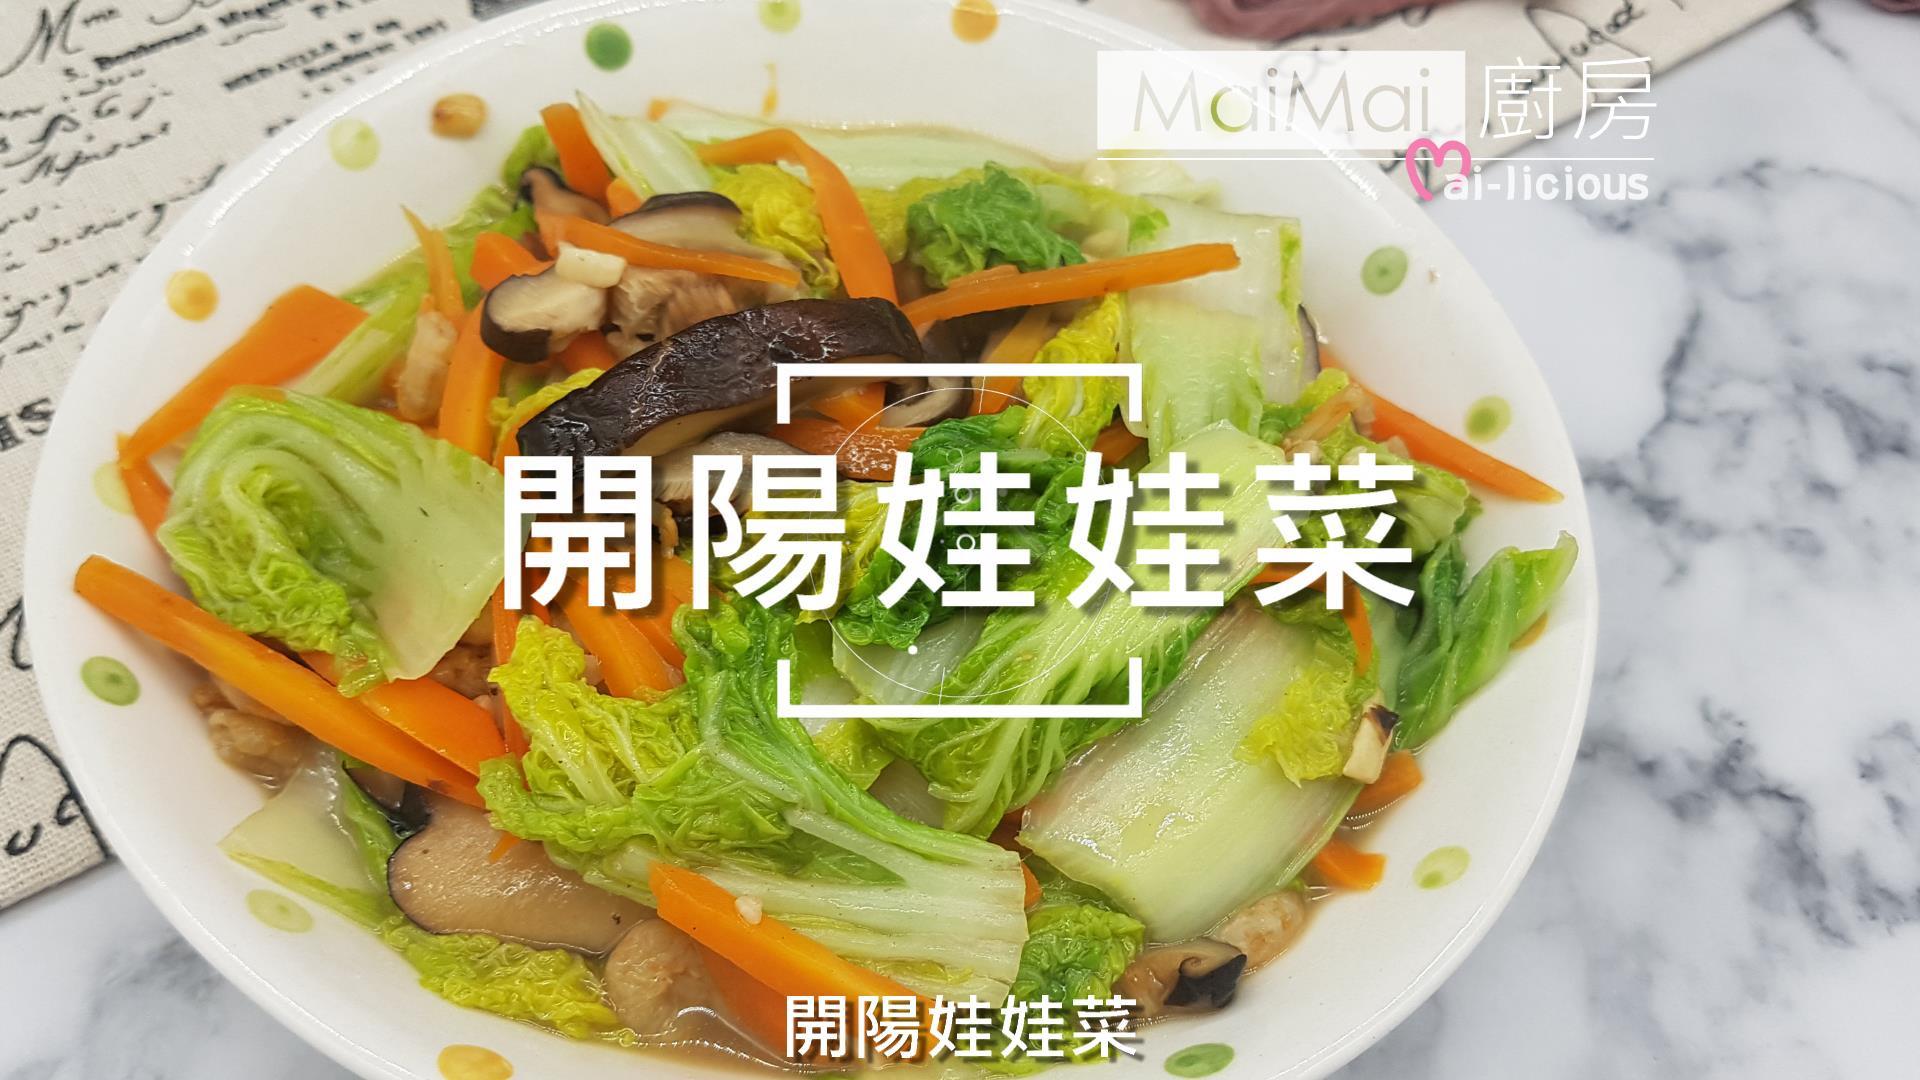 【MaiMai廚房】開陽娃娃菜